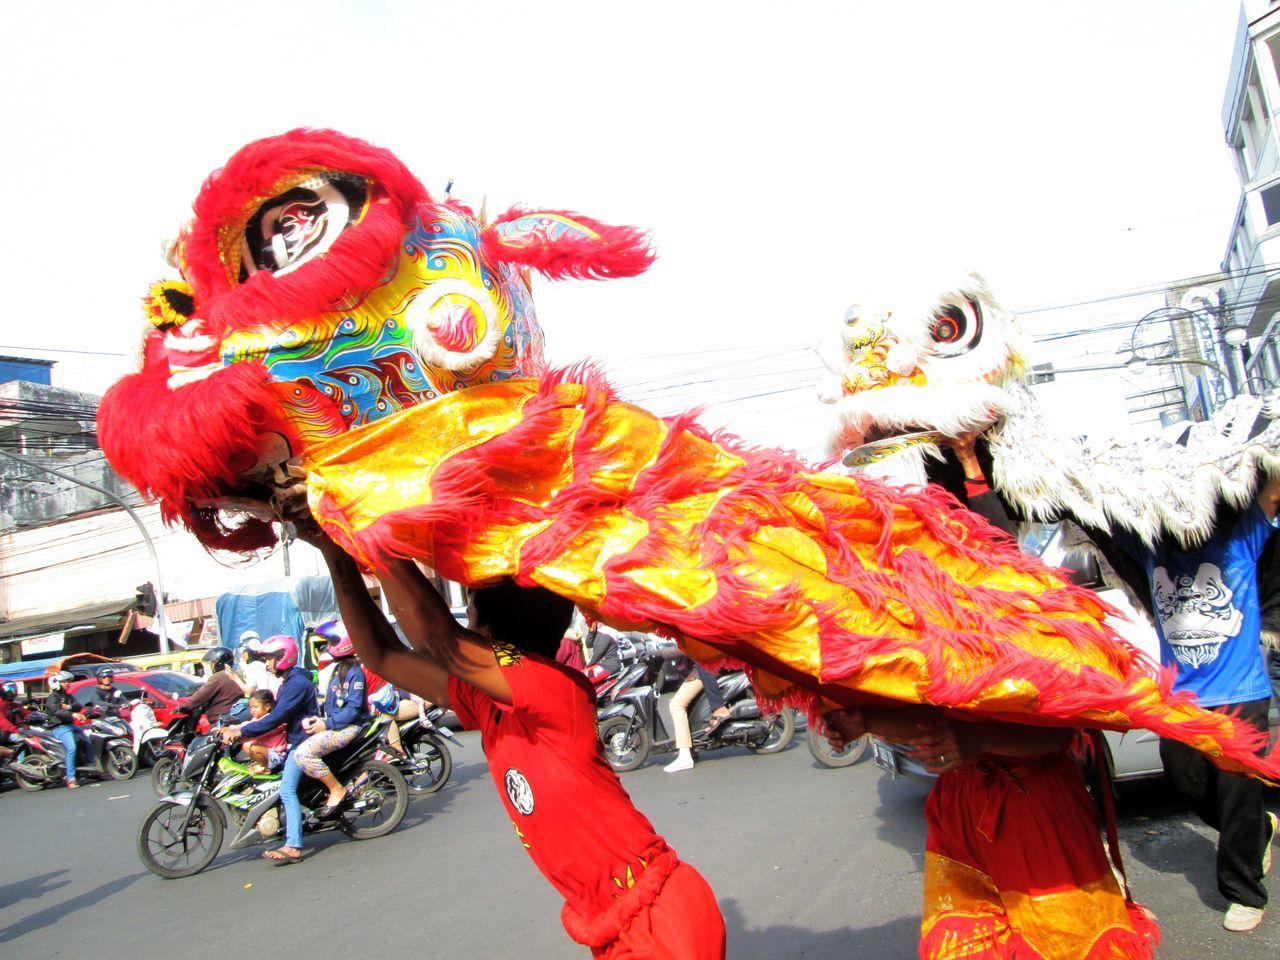 animal representation, dragon, land vehicle, chinese dragon, mode of transport, transportation, day, outdoors, animal themes, no people